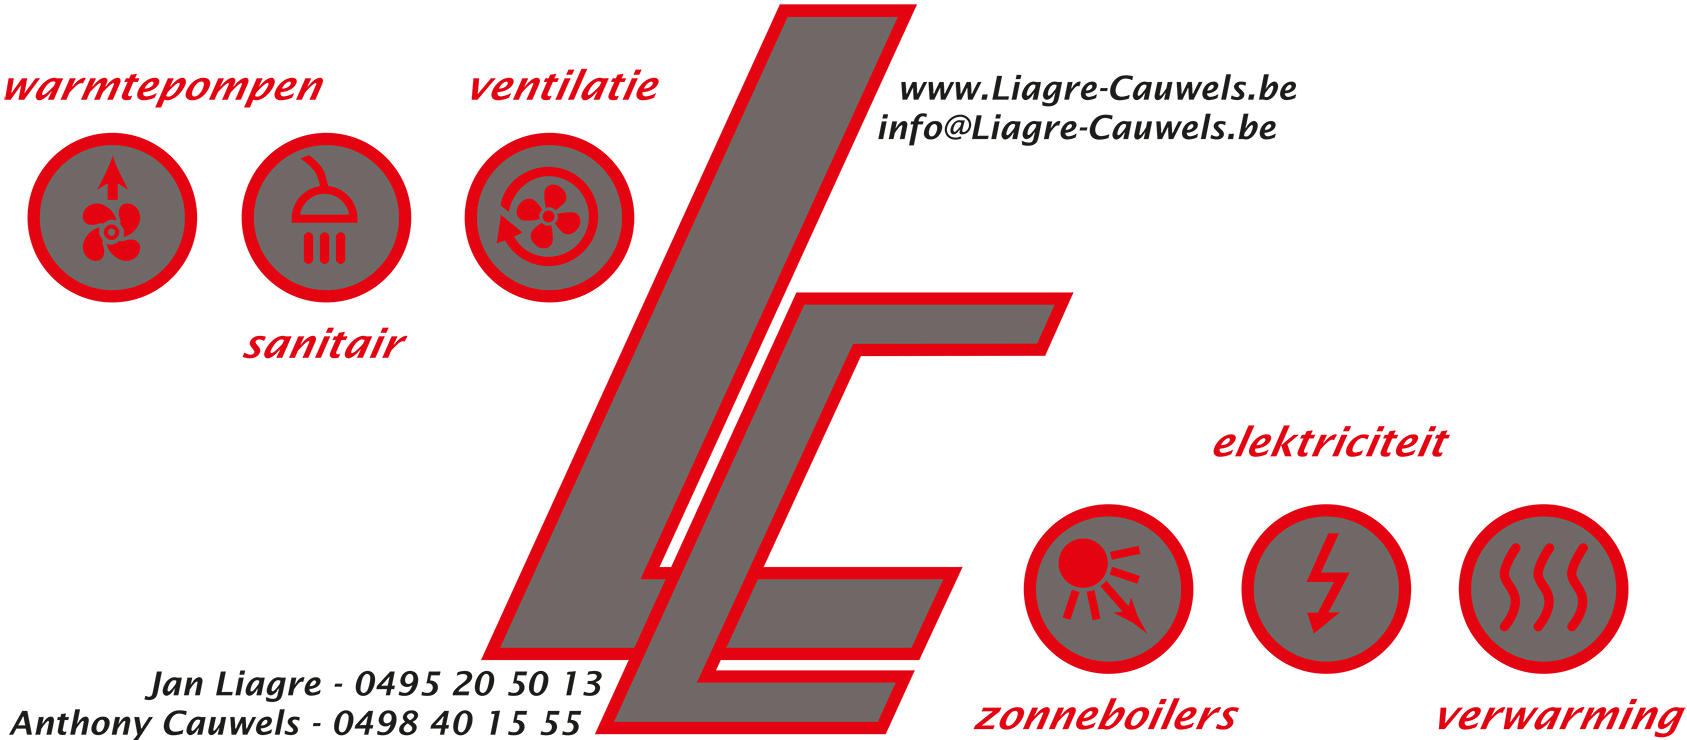 Logo Liagre-Frickelo Izegem